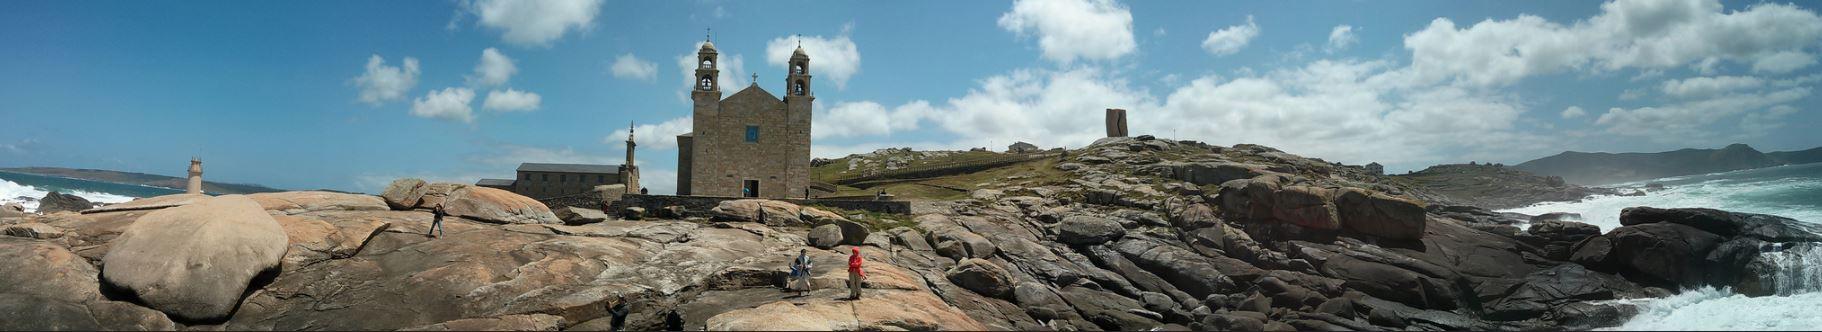 Panoramica Santuario da Virxe da Barca Muxia | Foto manuelfouce & anaramos